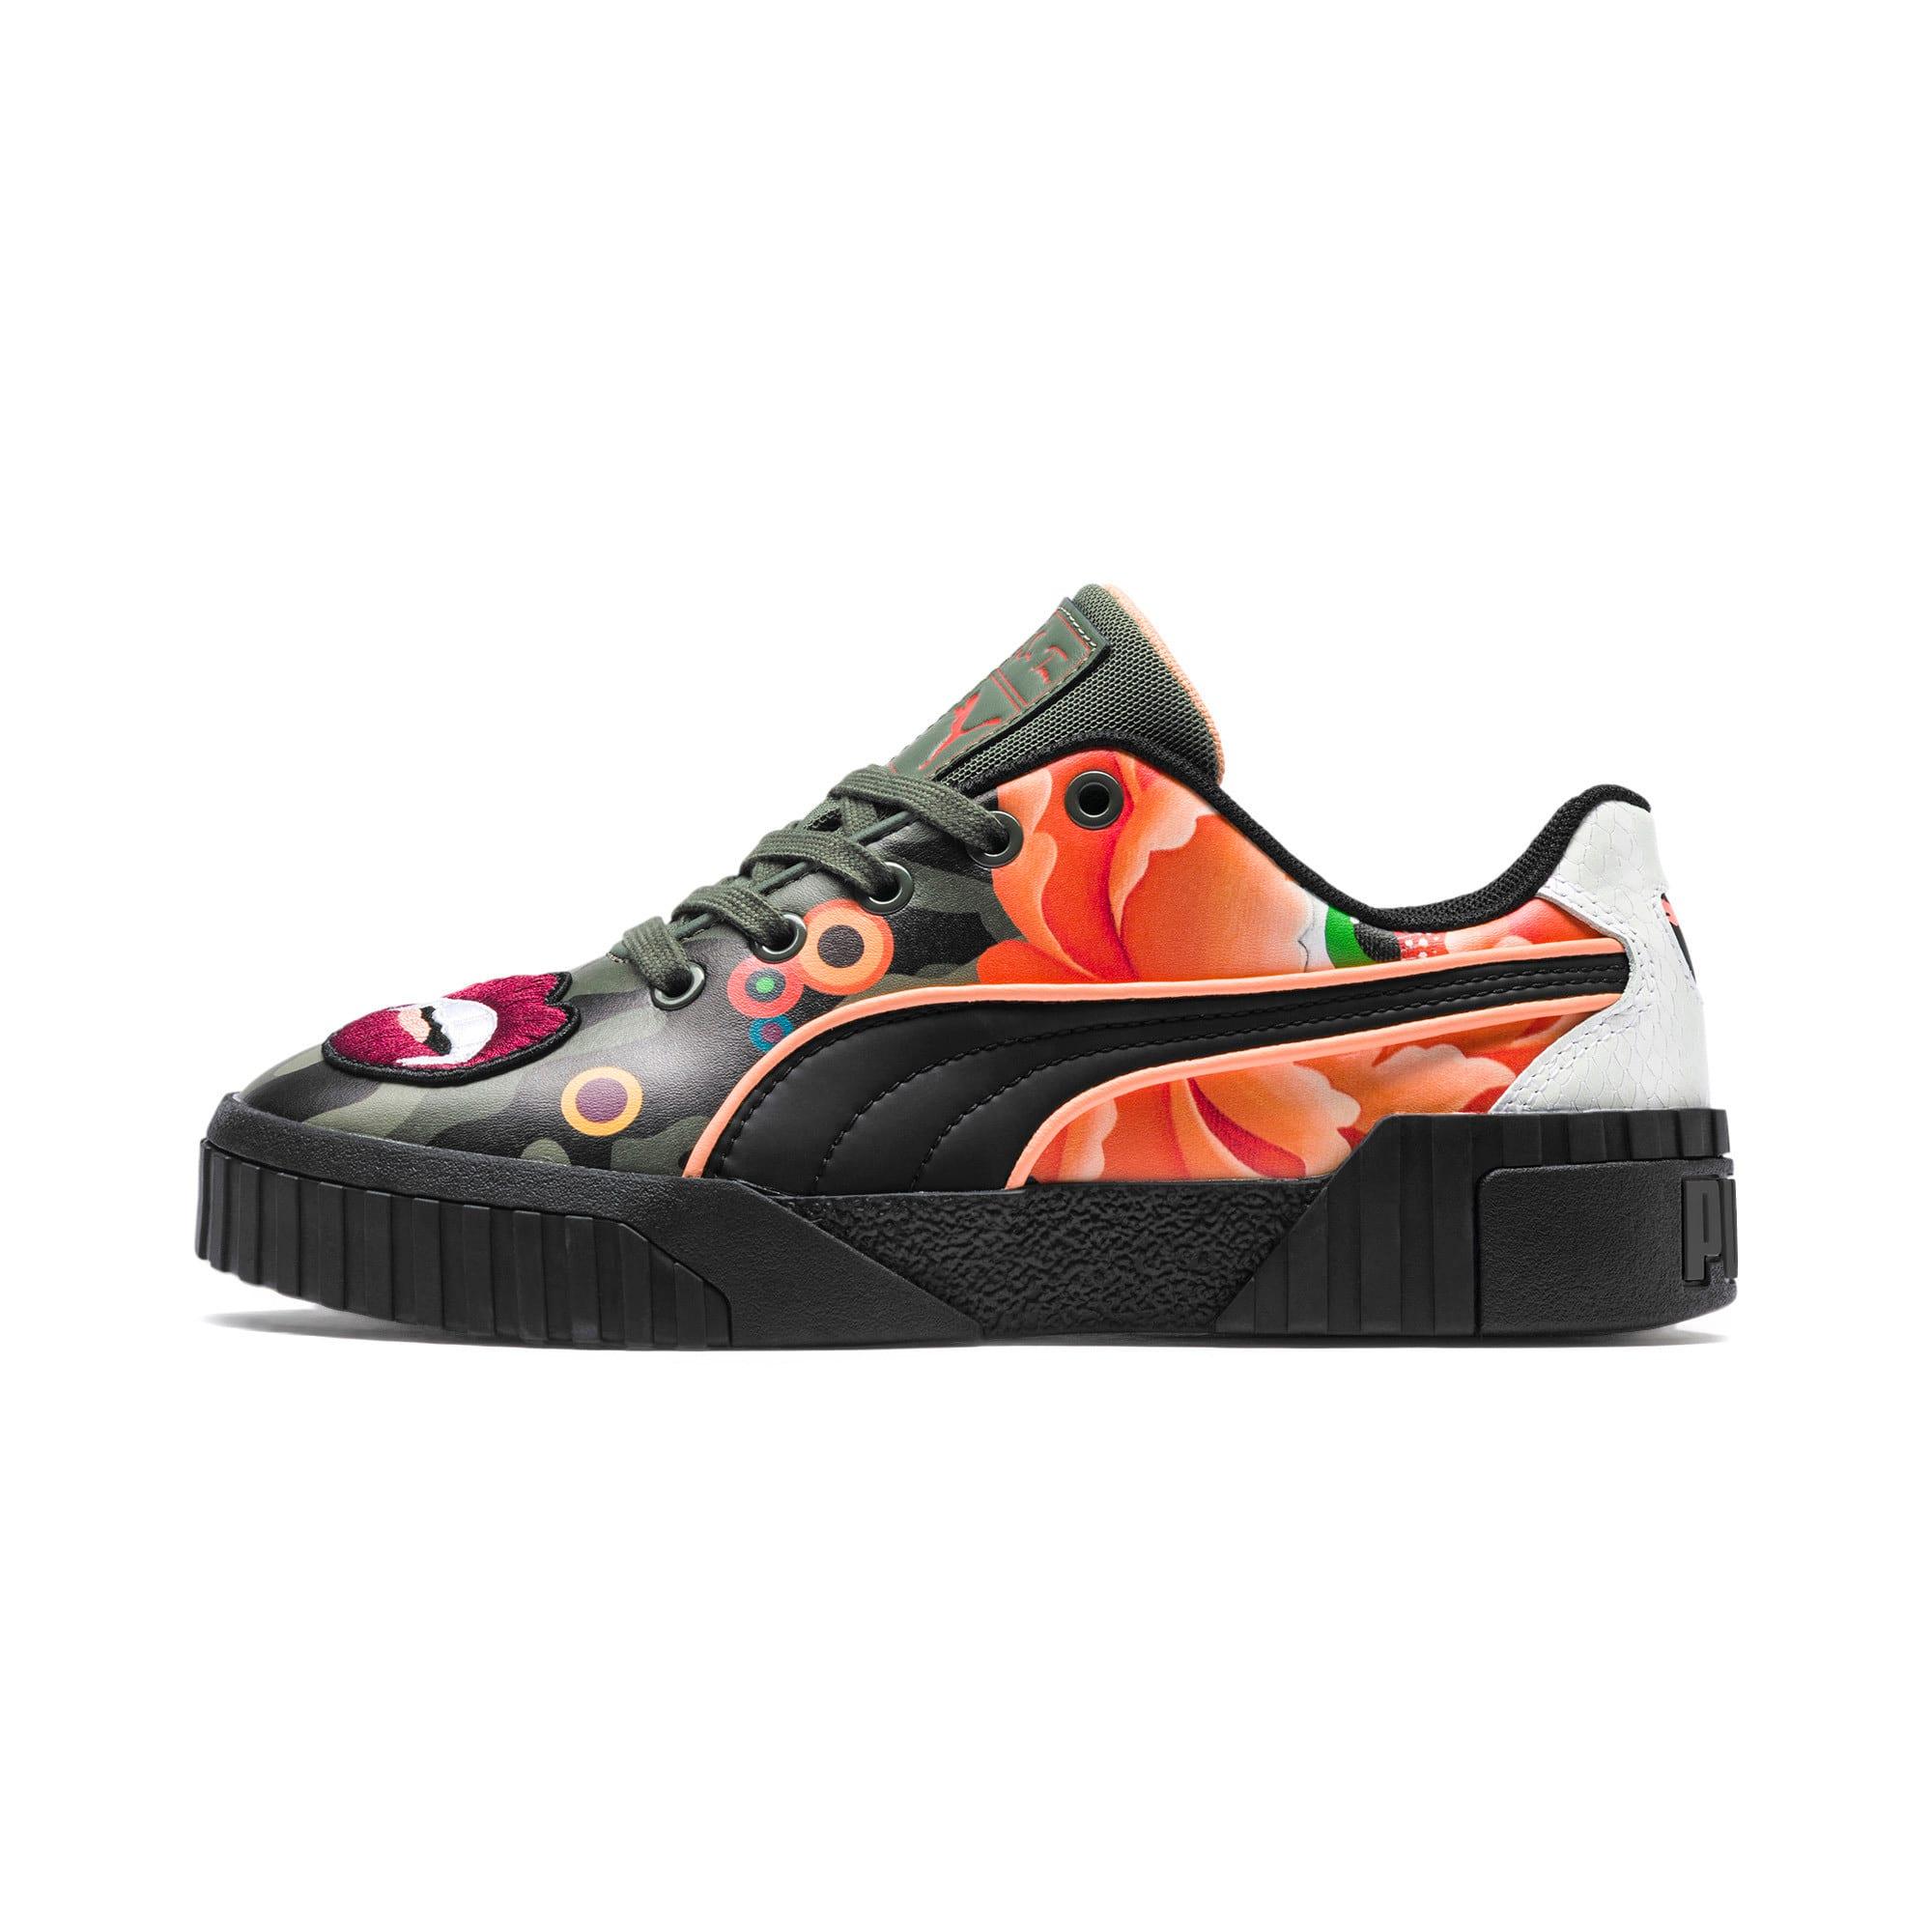 Thumbnail 1 of PUMA x SUE TSAI Cali 'Peonies Camo' Women's Sneakers, Puma Black-Puma Black, medium